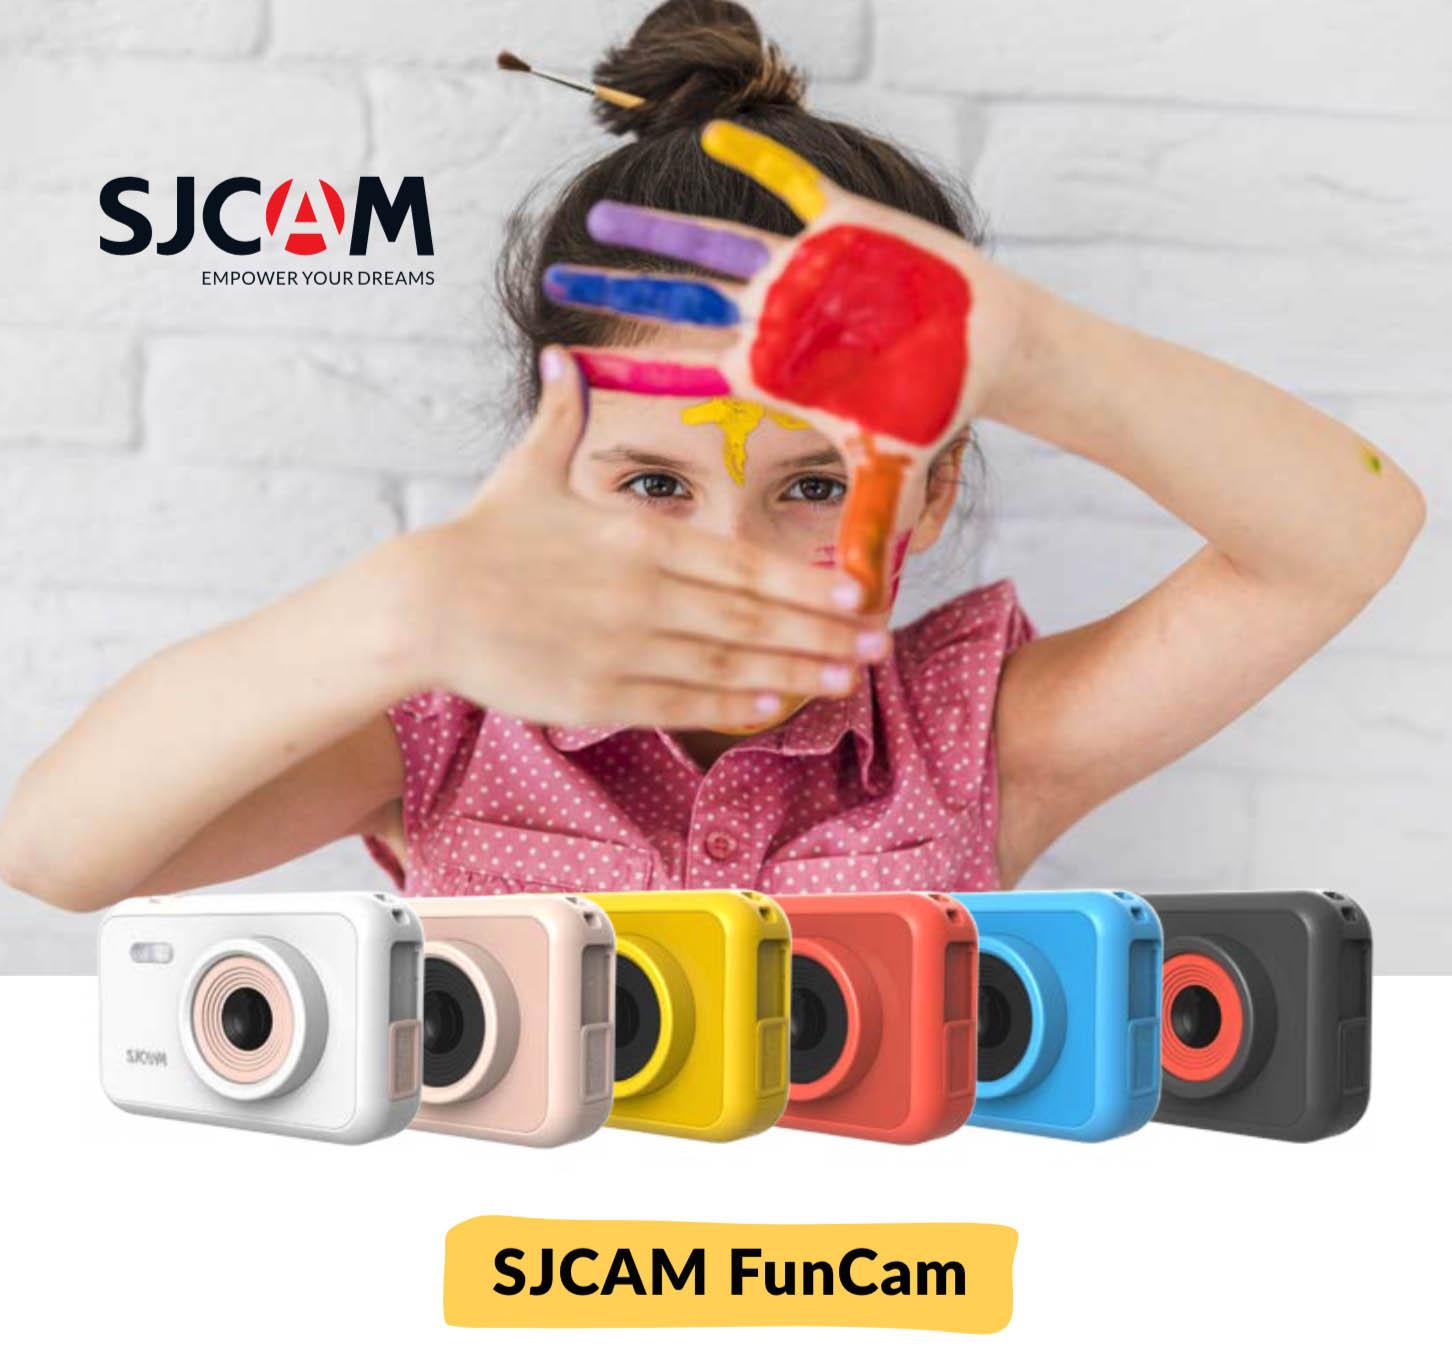 funcam-kids-hd-camera-features-main